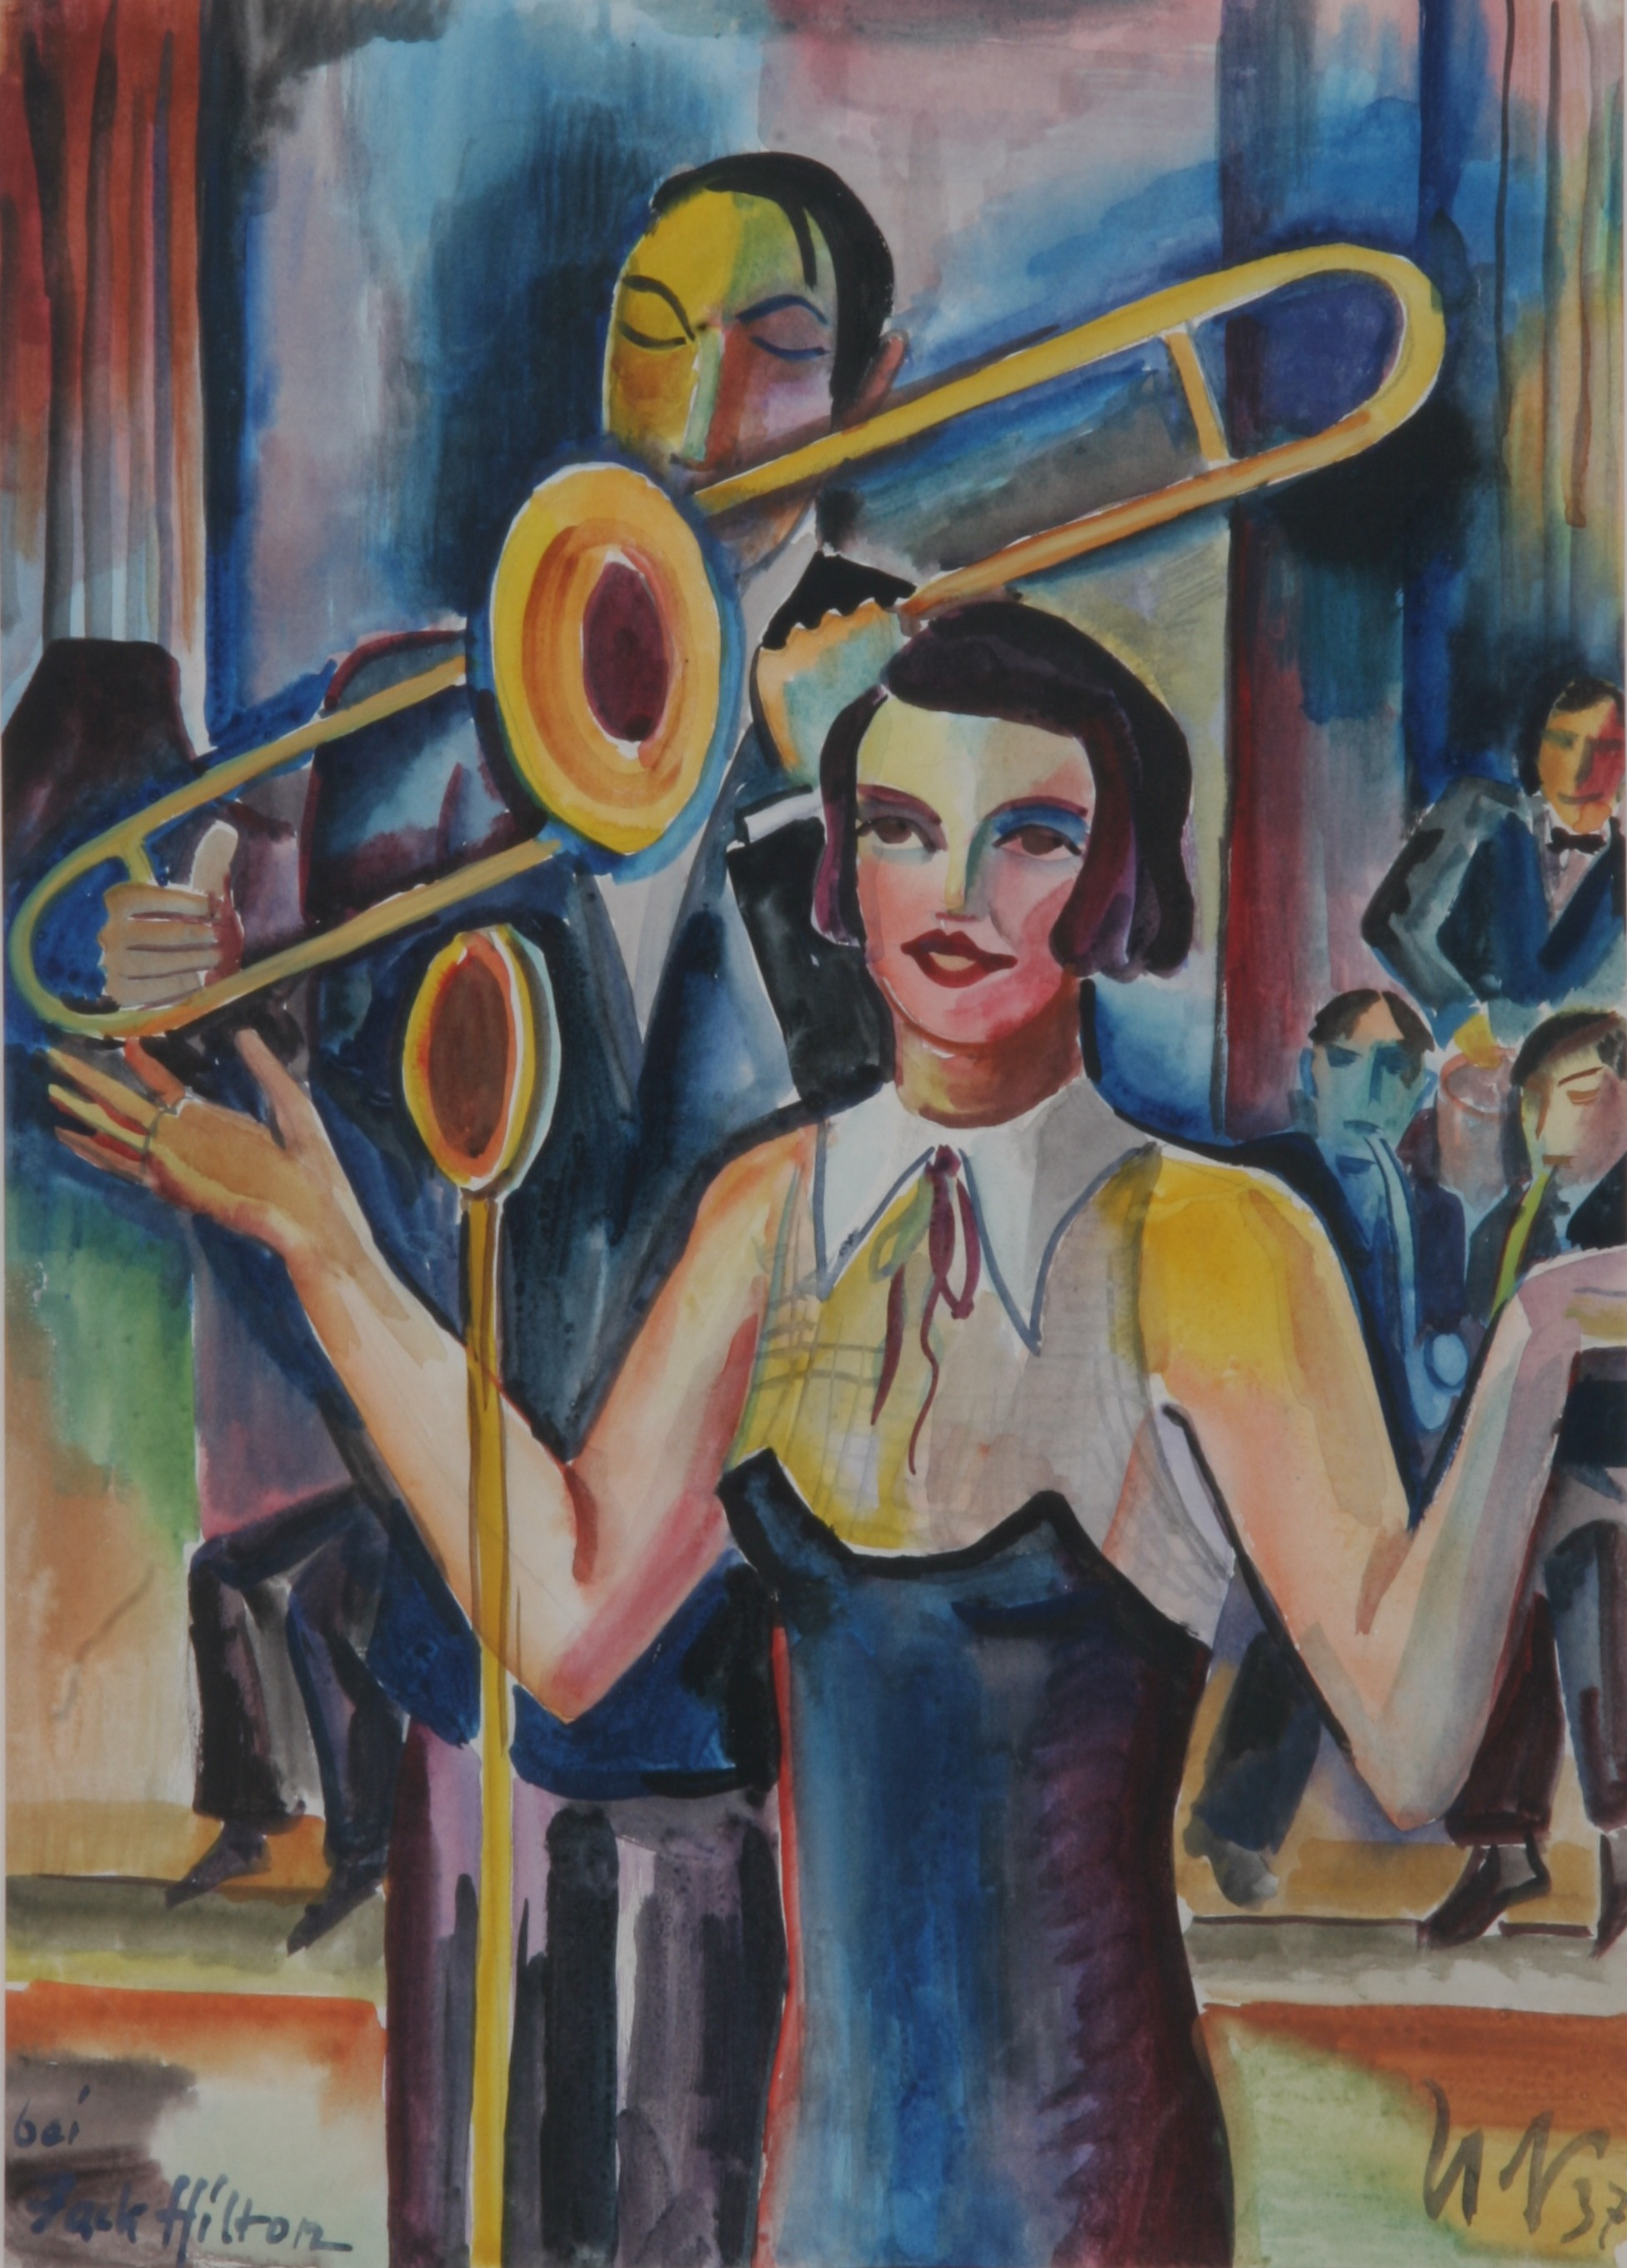 Bei Jack Hilton, 1937, Aquarell, 36,5 x 51 cm